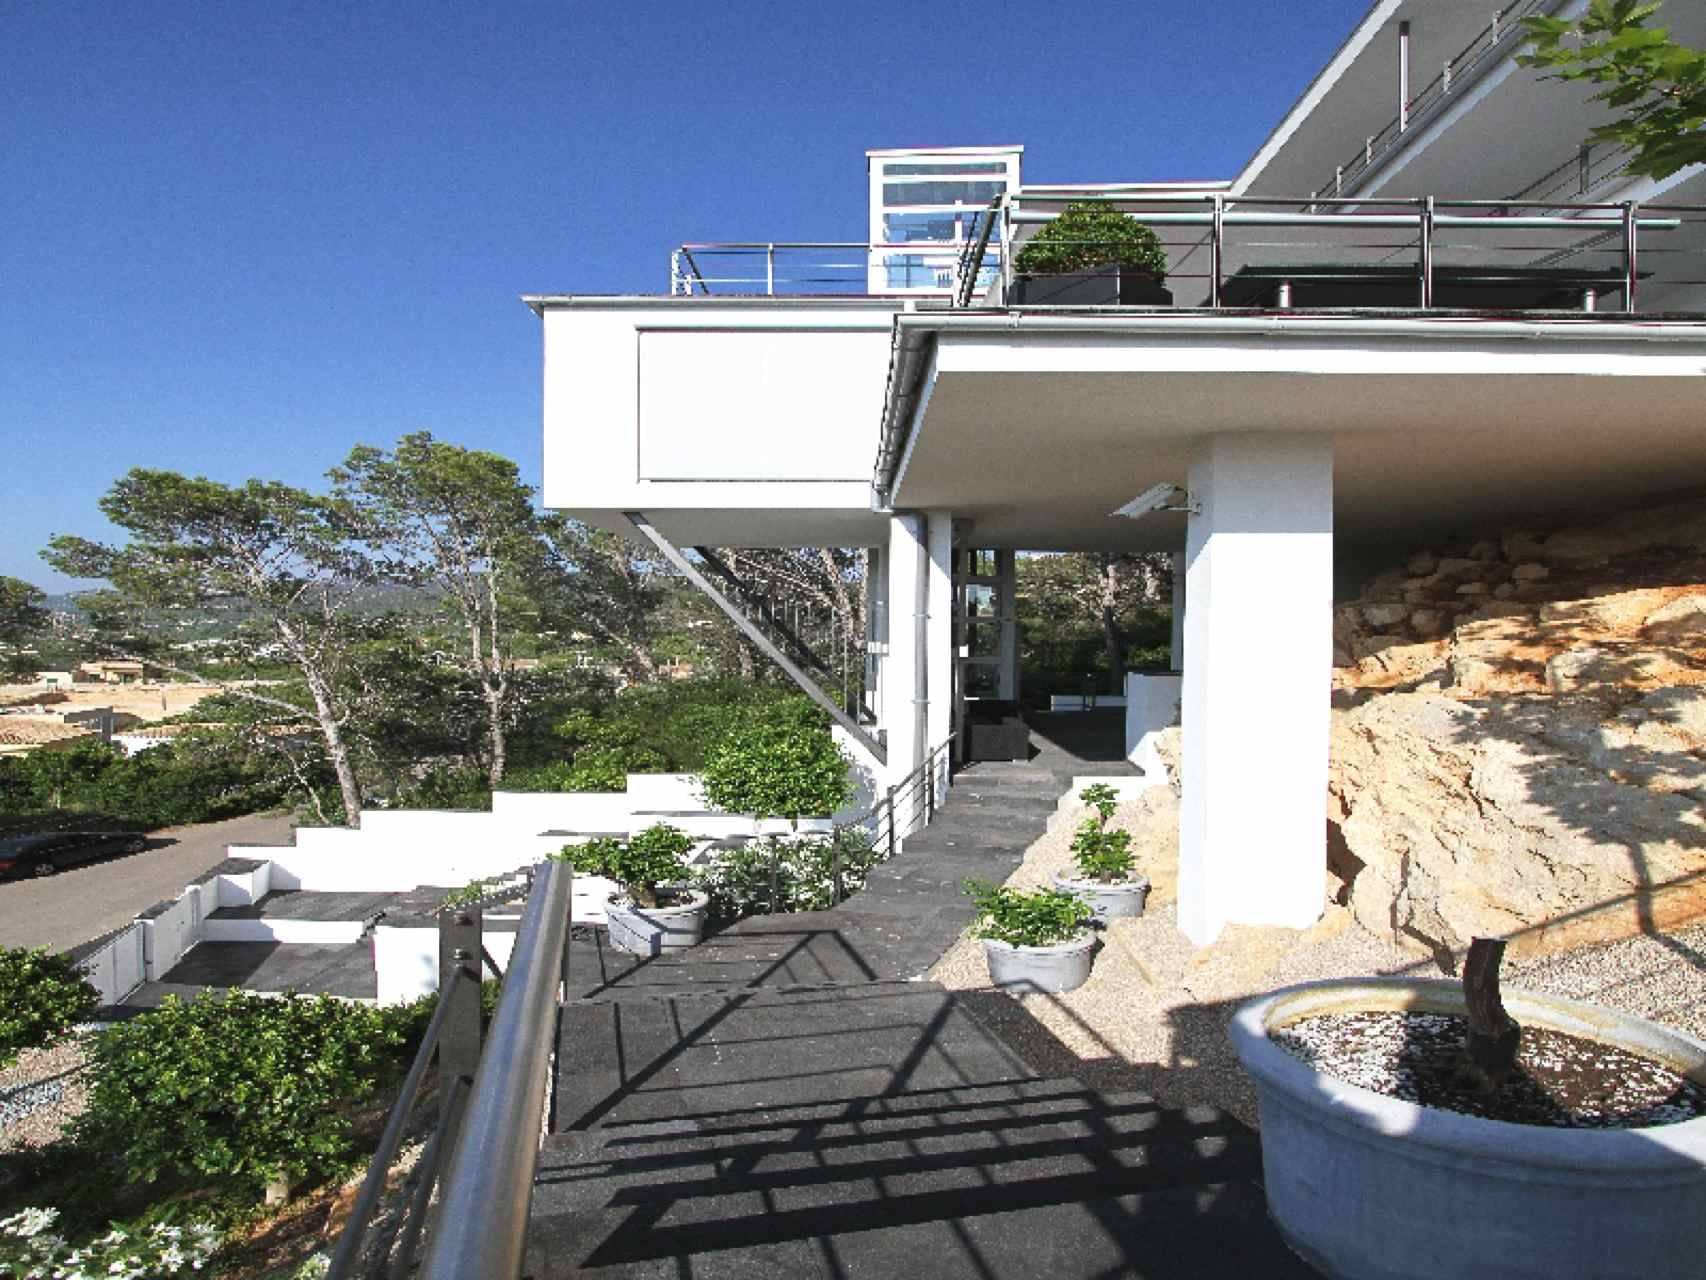 01-04 Bauhaus Villa Mallorca Südwesten Bild 13